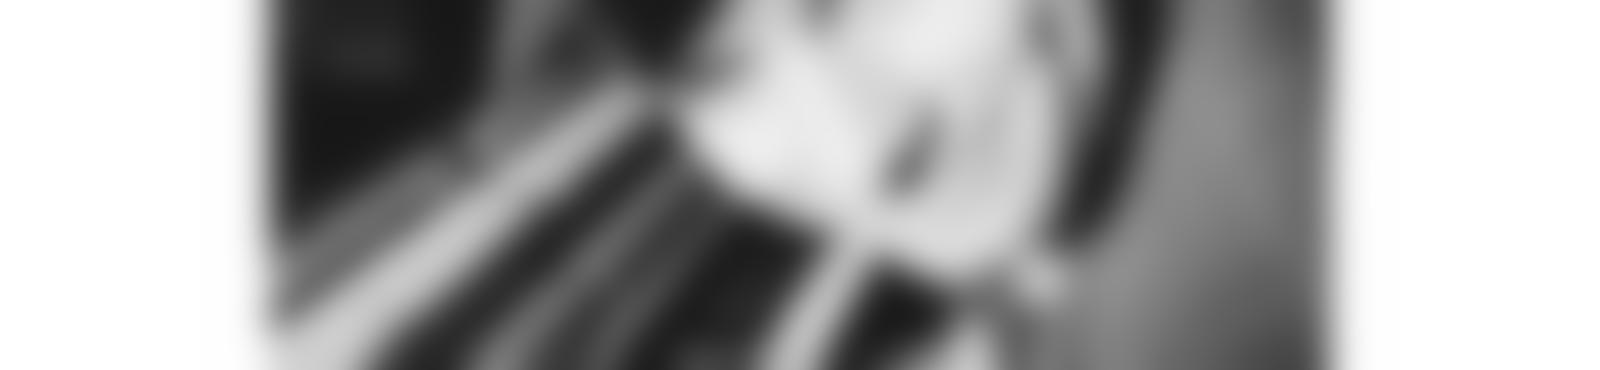 Blurred 411be8a4 3173 4425 842d cc18bea5431f